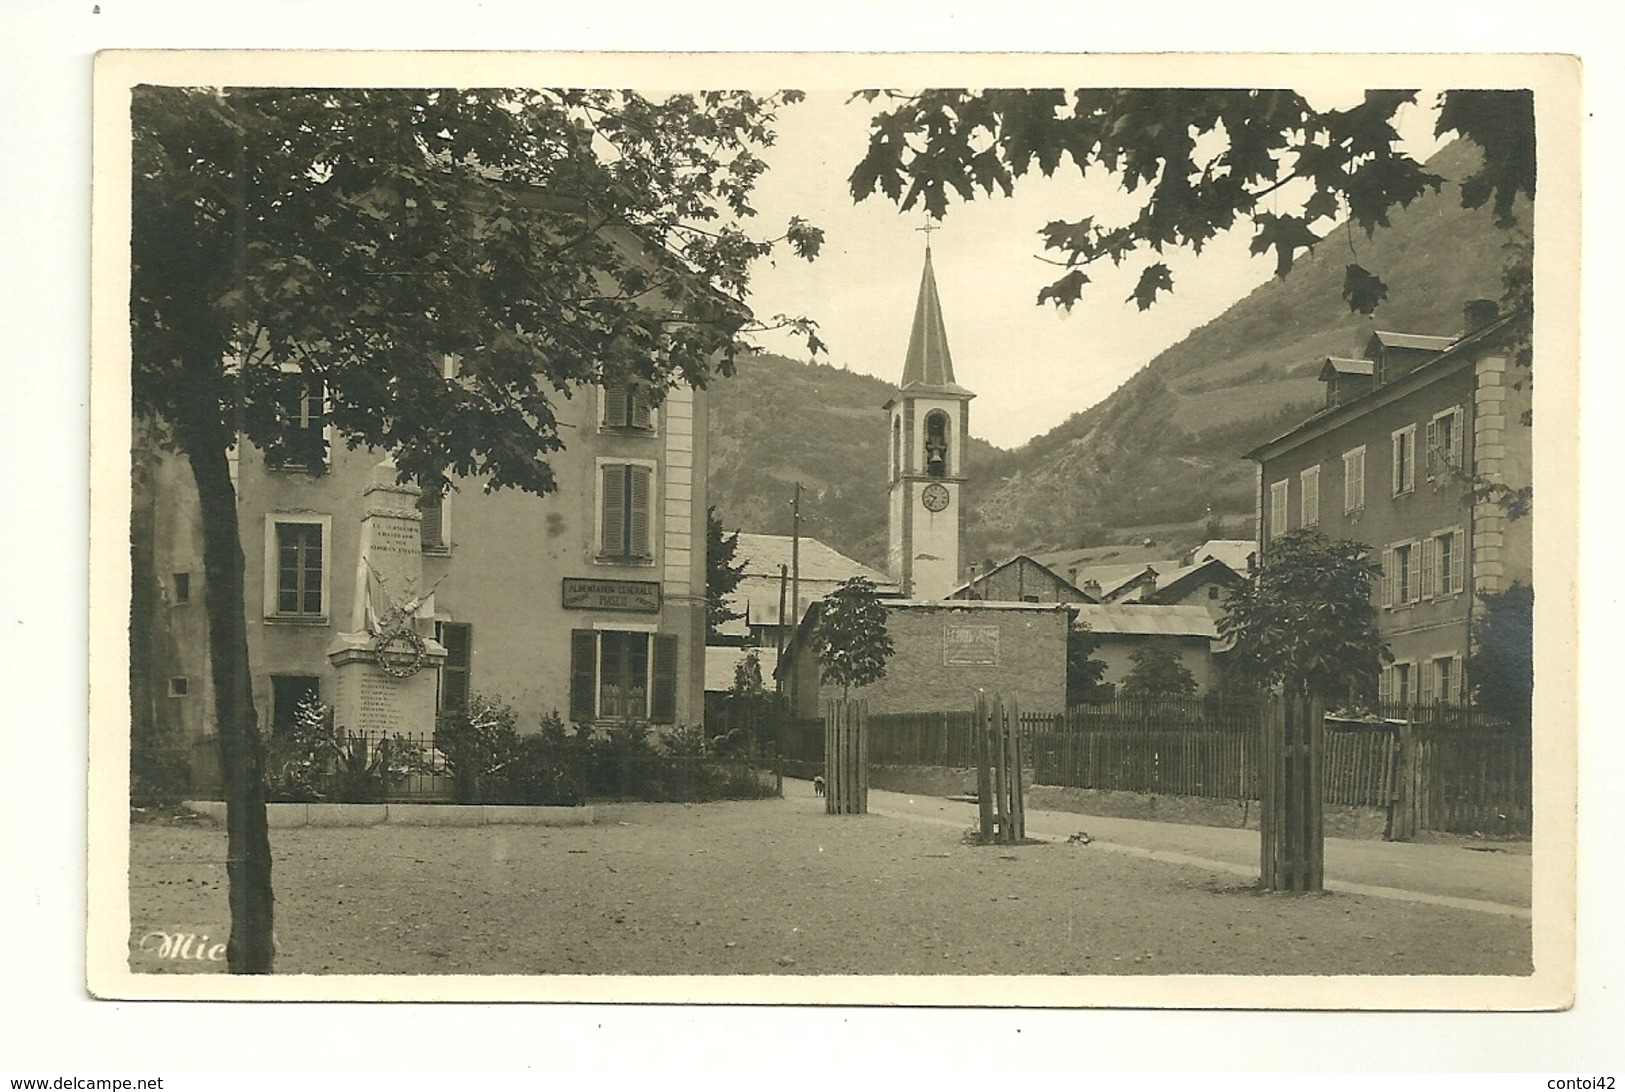 04 LA CONDAMINE MONUMENT AUX MORTS GUERRE ALIMENTATION PIASCO EDITEUR MIC VALLEE UBAYE - France